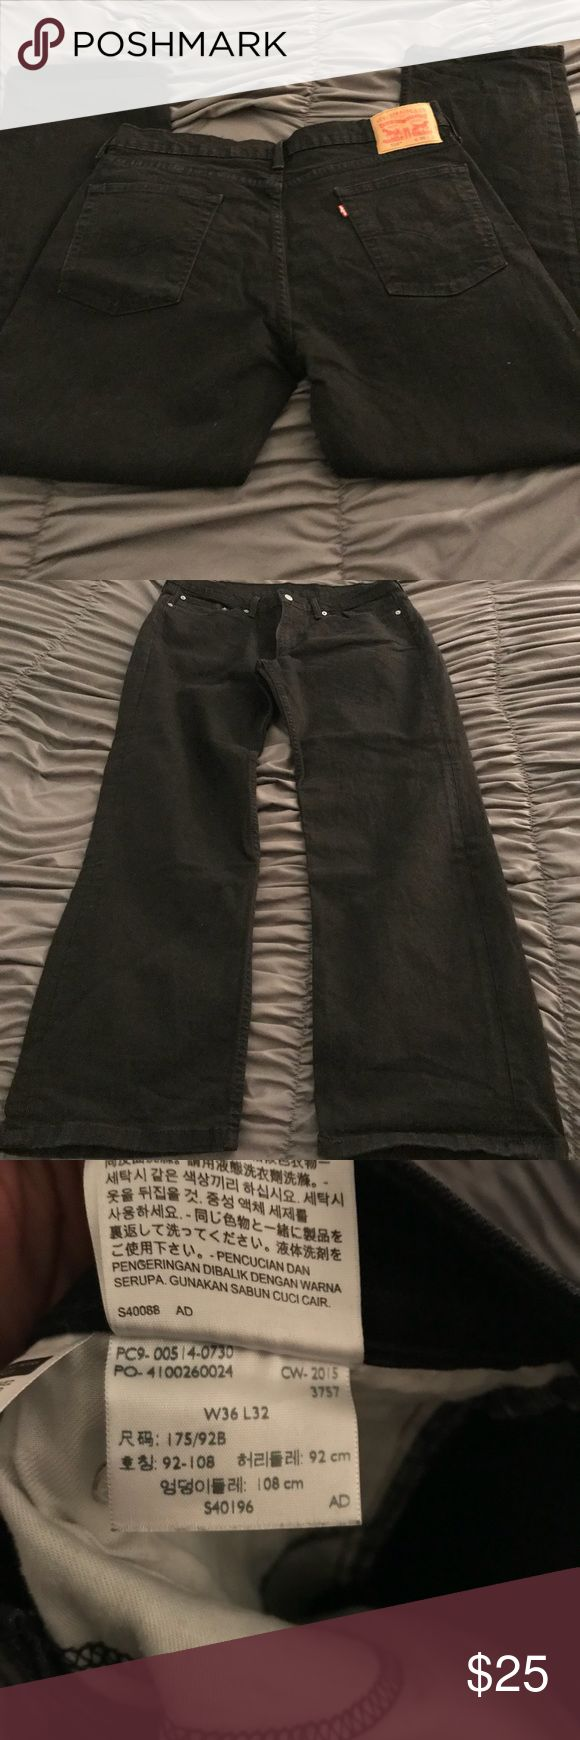 Men's black Levi jeans Slightly used men's black Levi's!! GUC! 514 style Levi's Jeans Relaxed